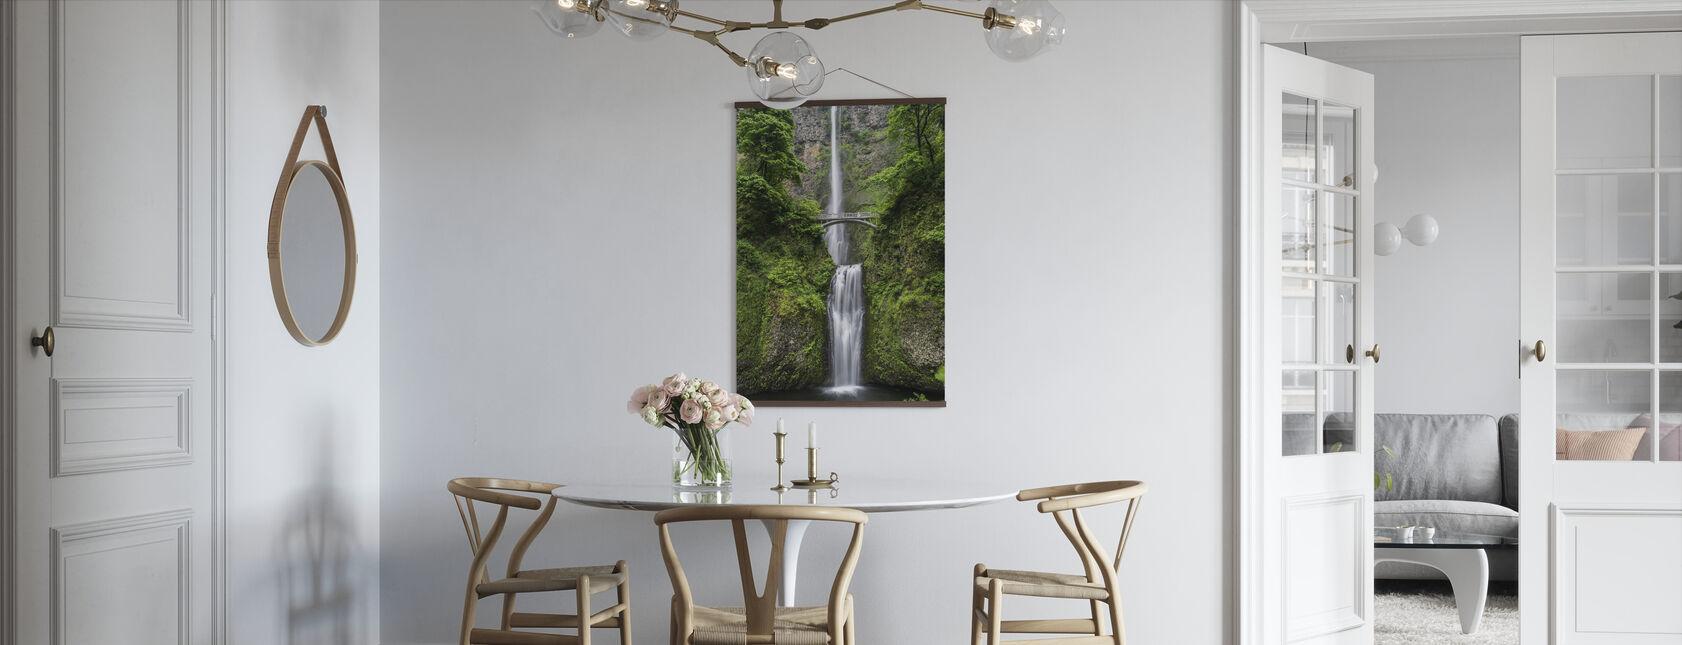 Bridge and Waterfall - Poster - Kitchen